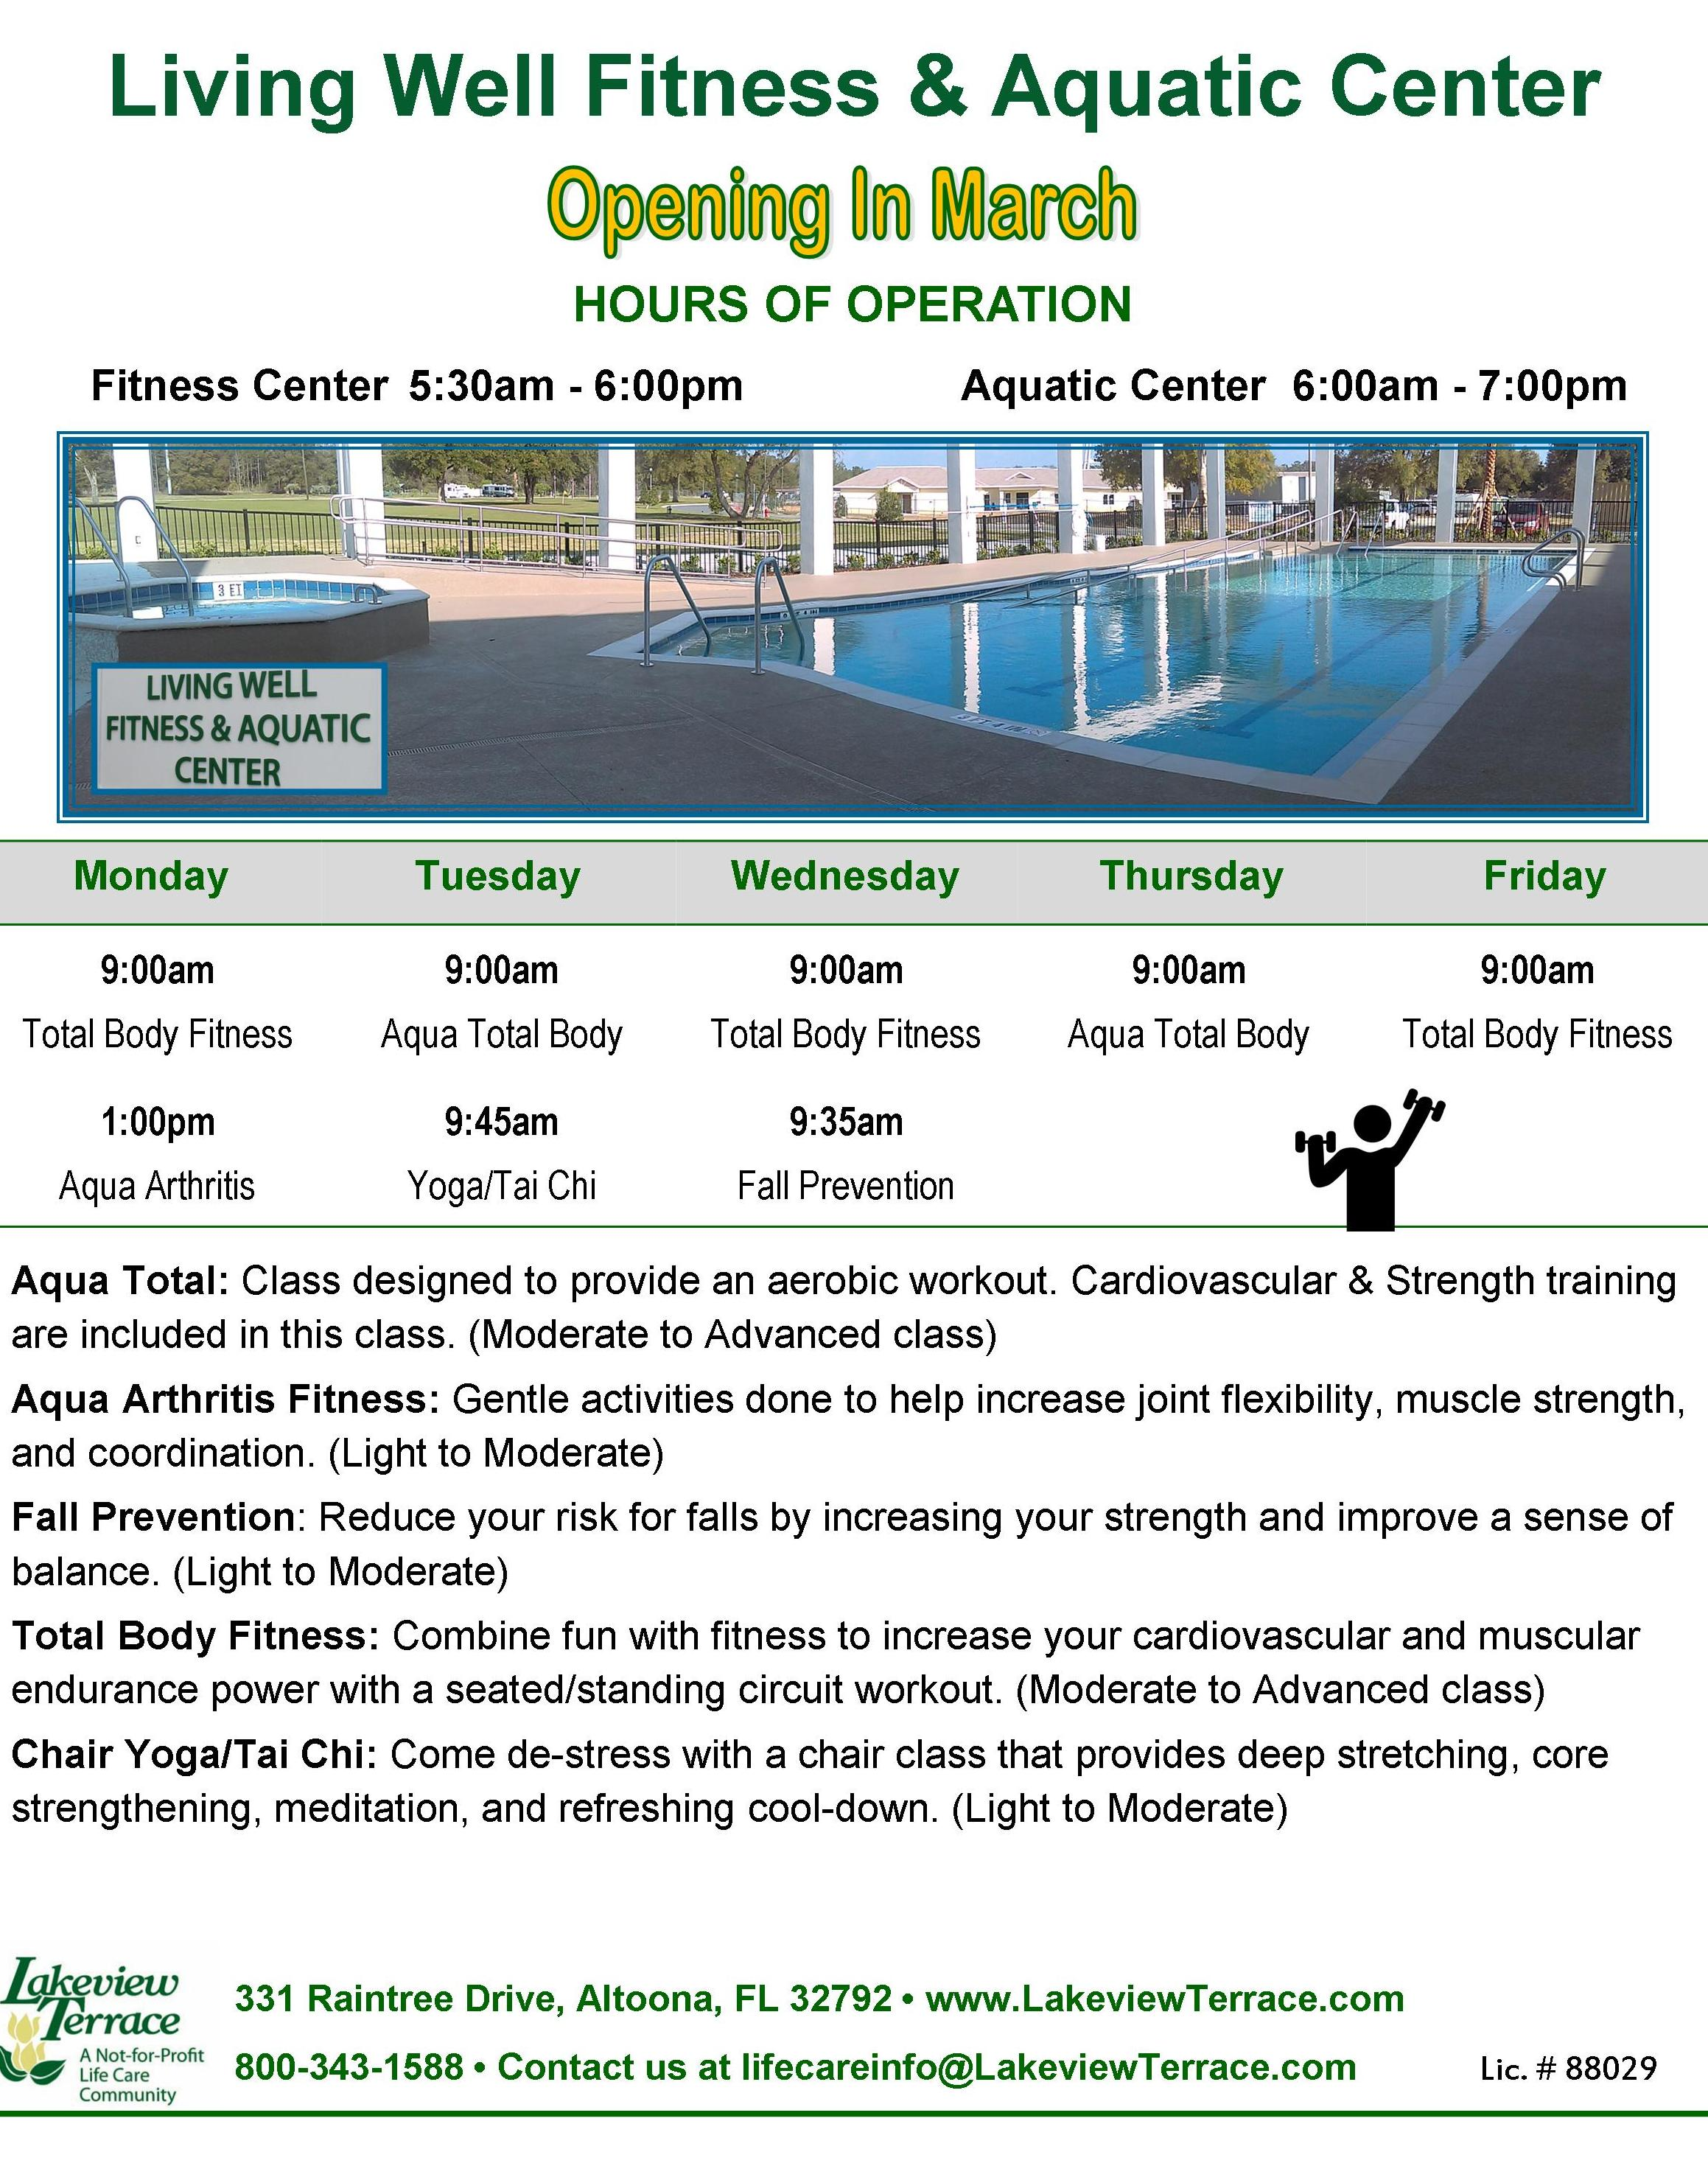 Living Well Fitness & Aquatic Center